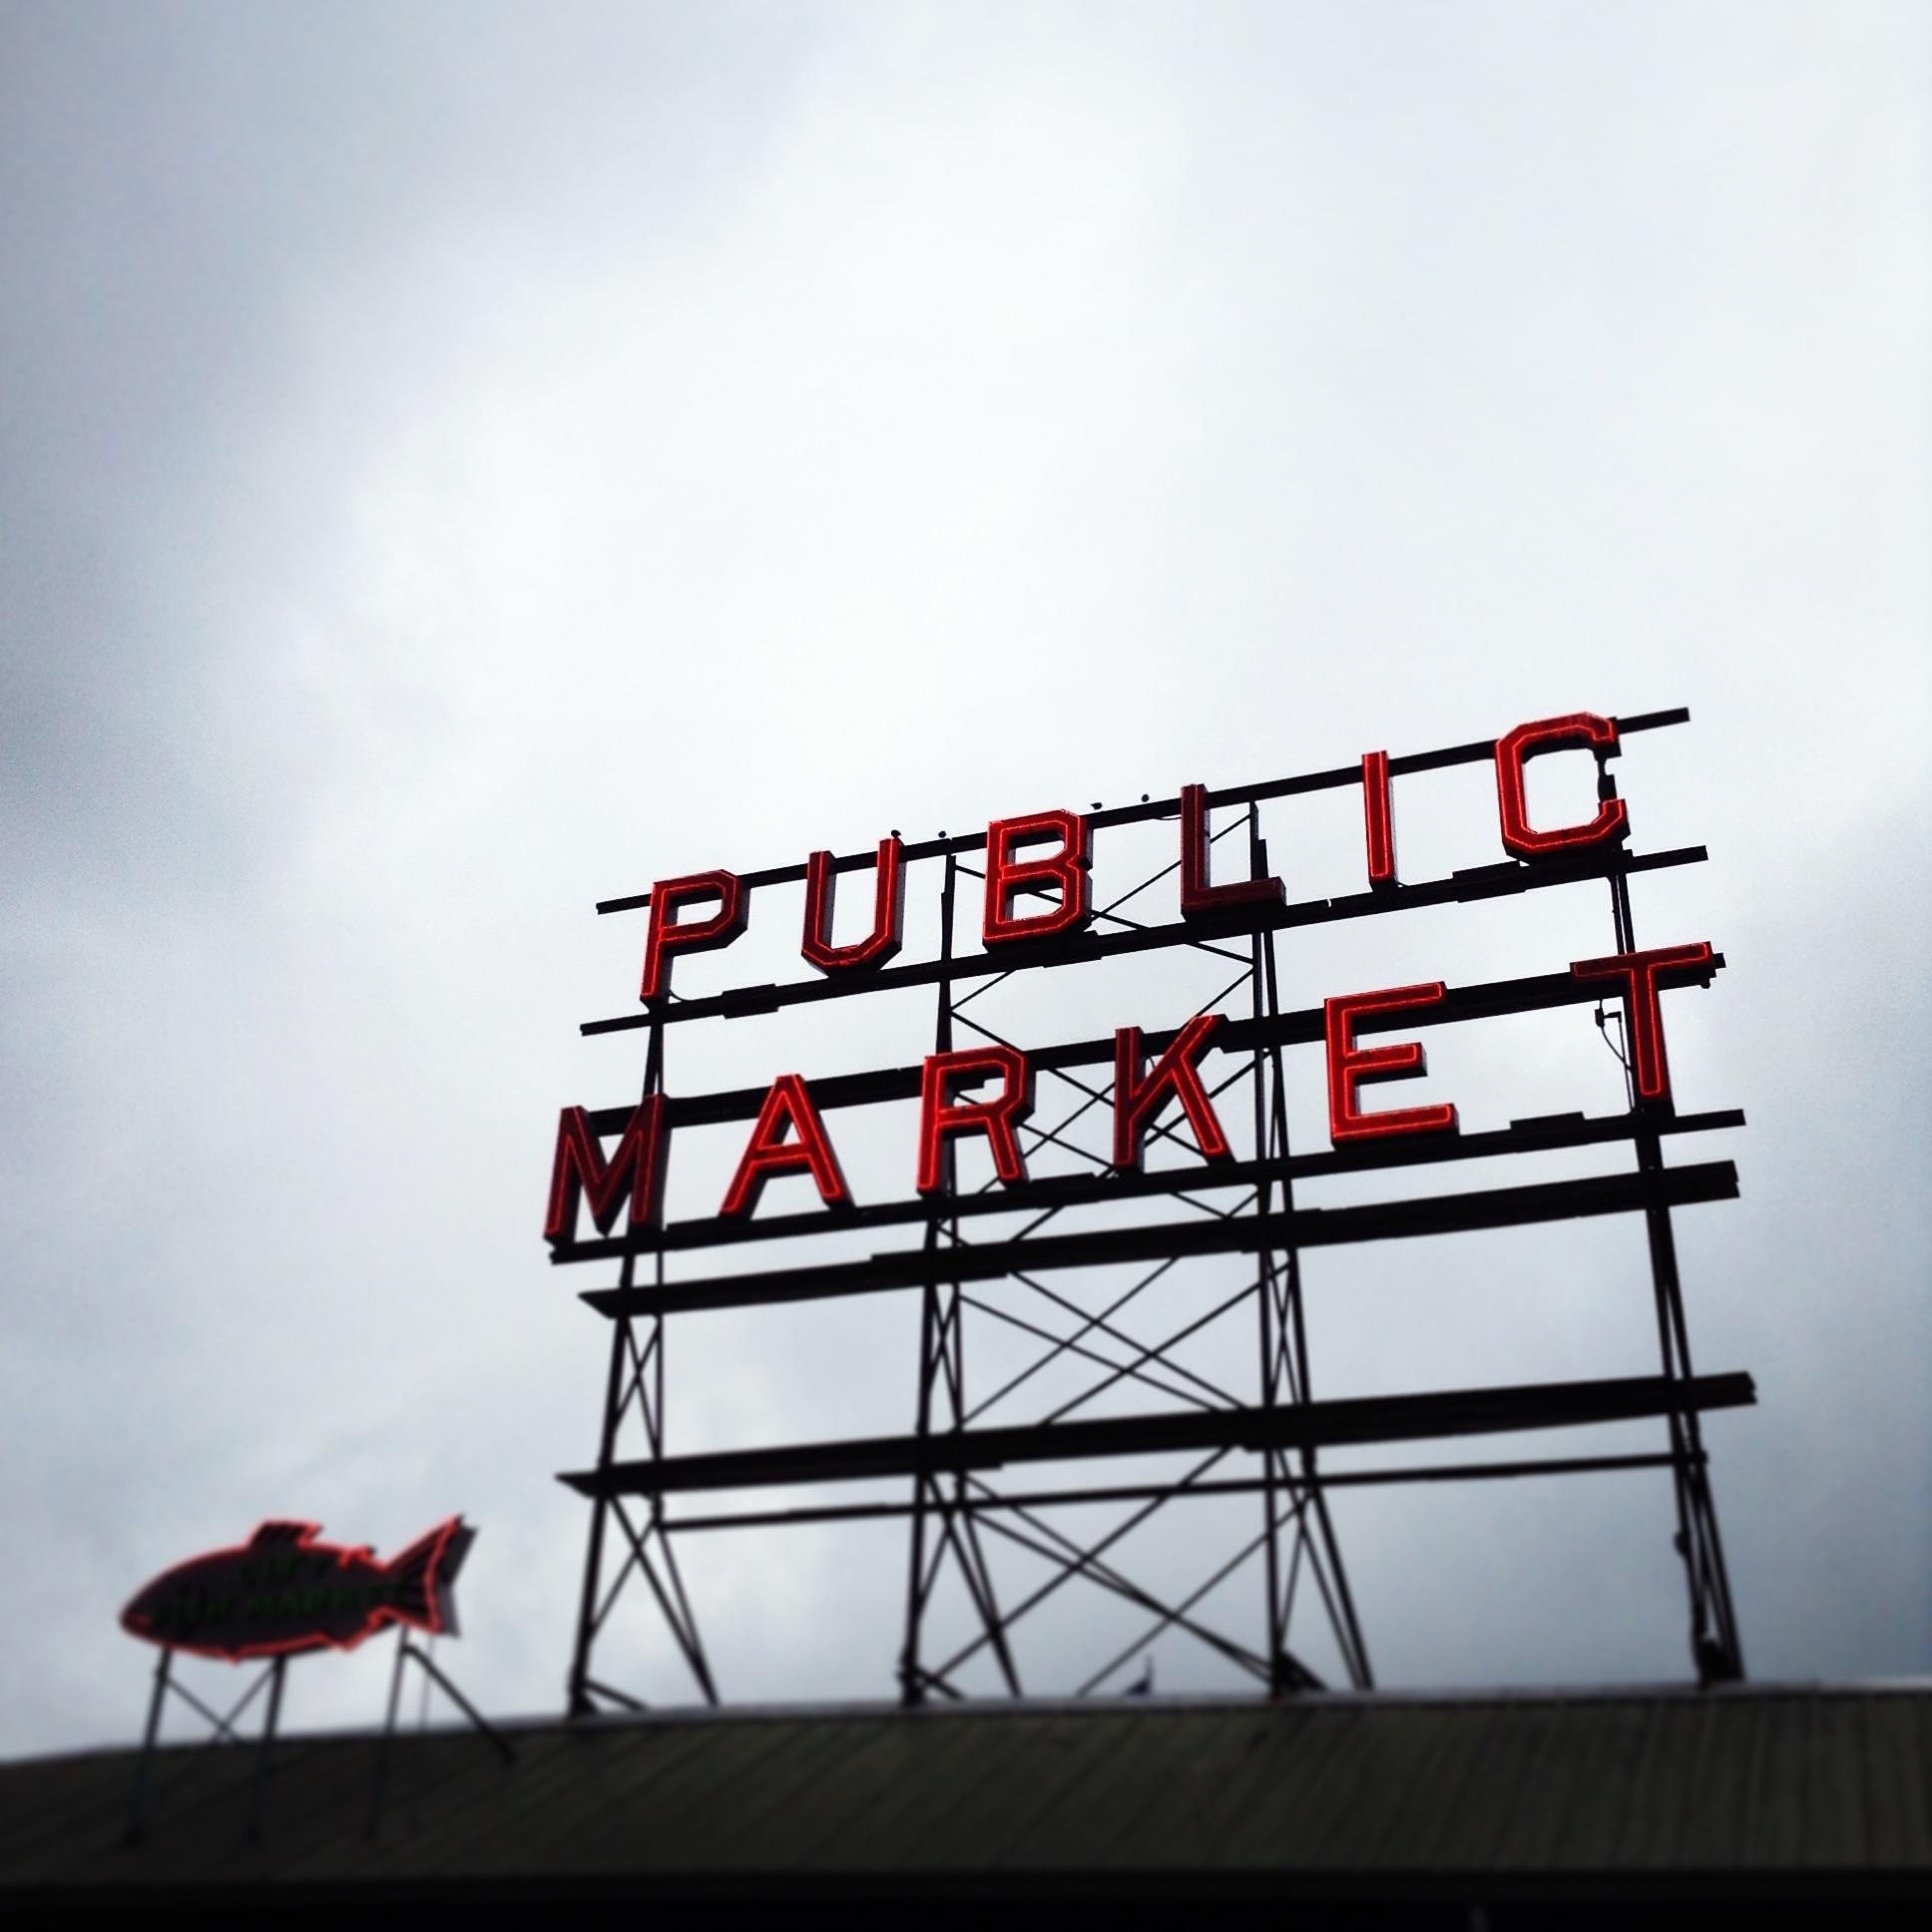 Pike Place Market | A Dash of Cinema